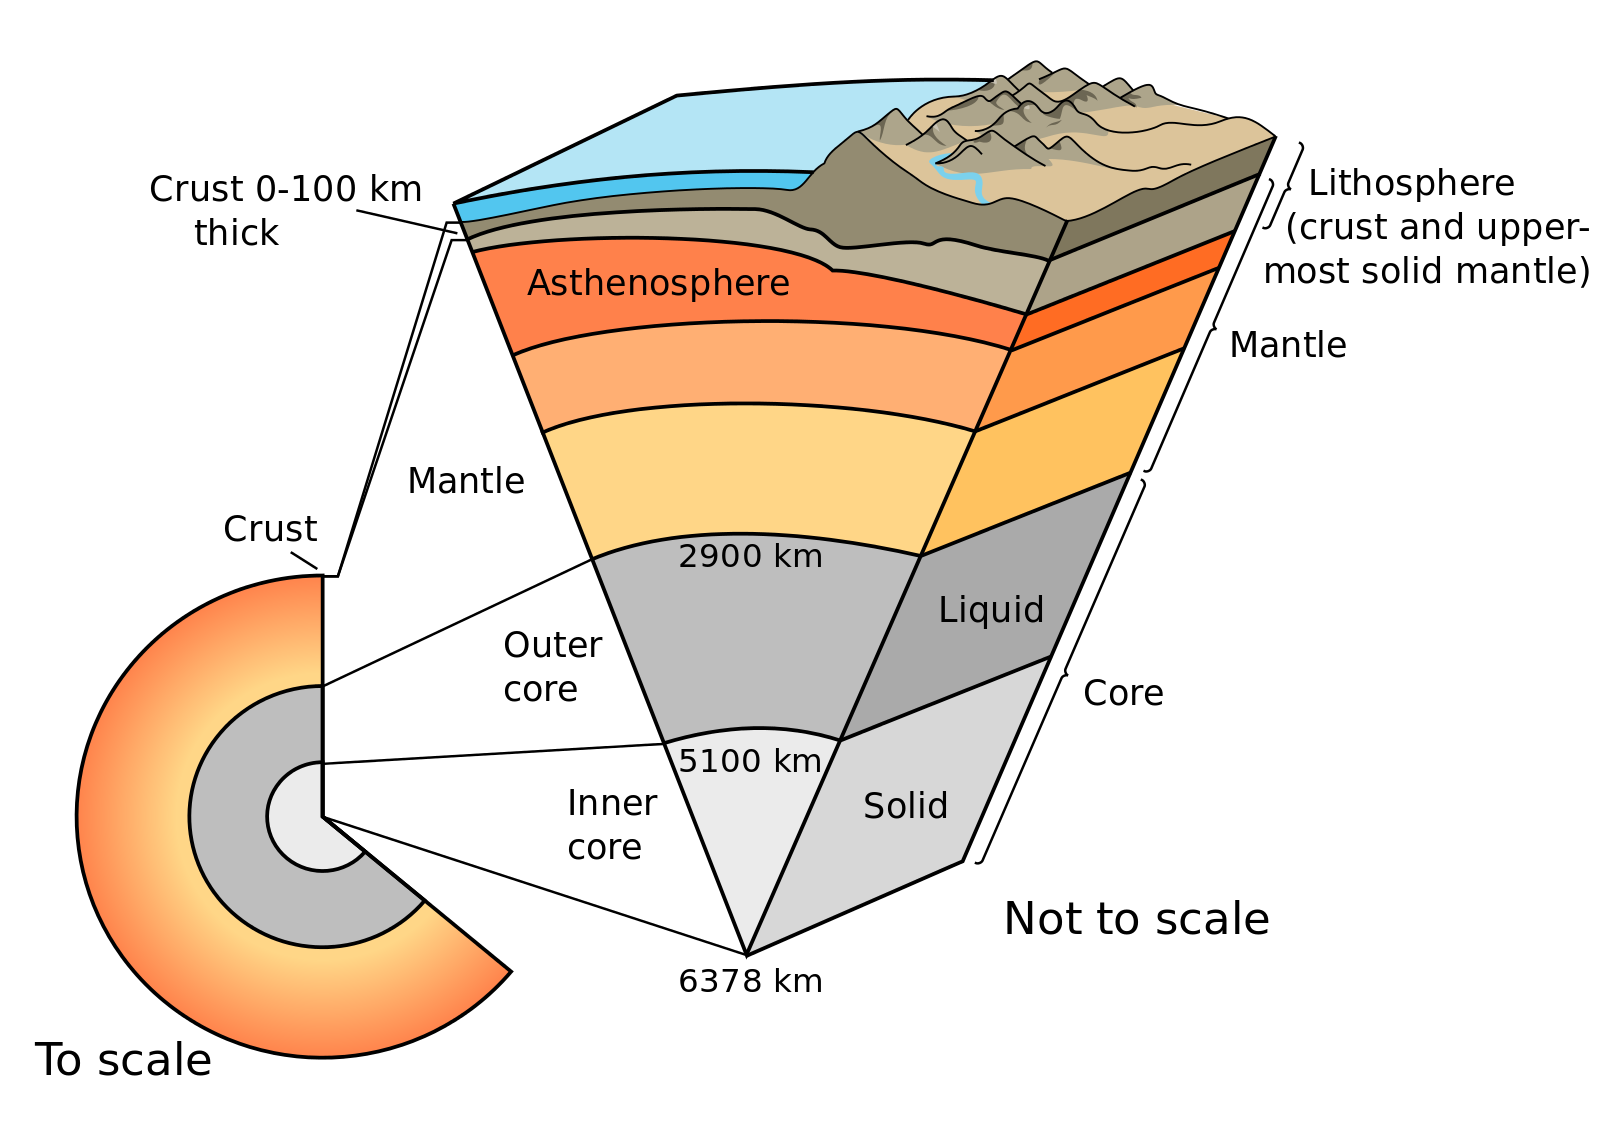 medium resolution of file earth cutaway schematic english svg